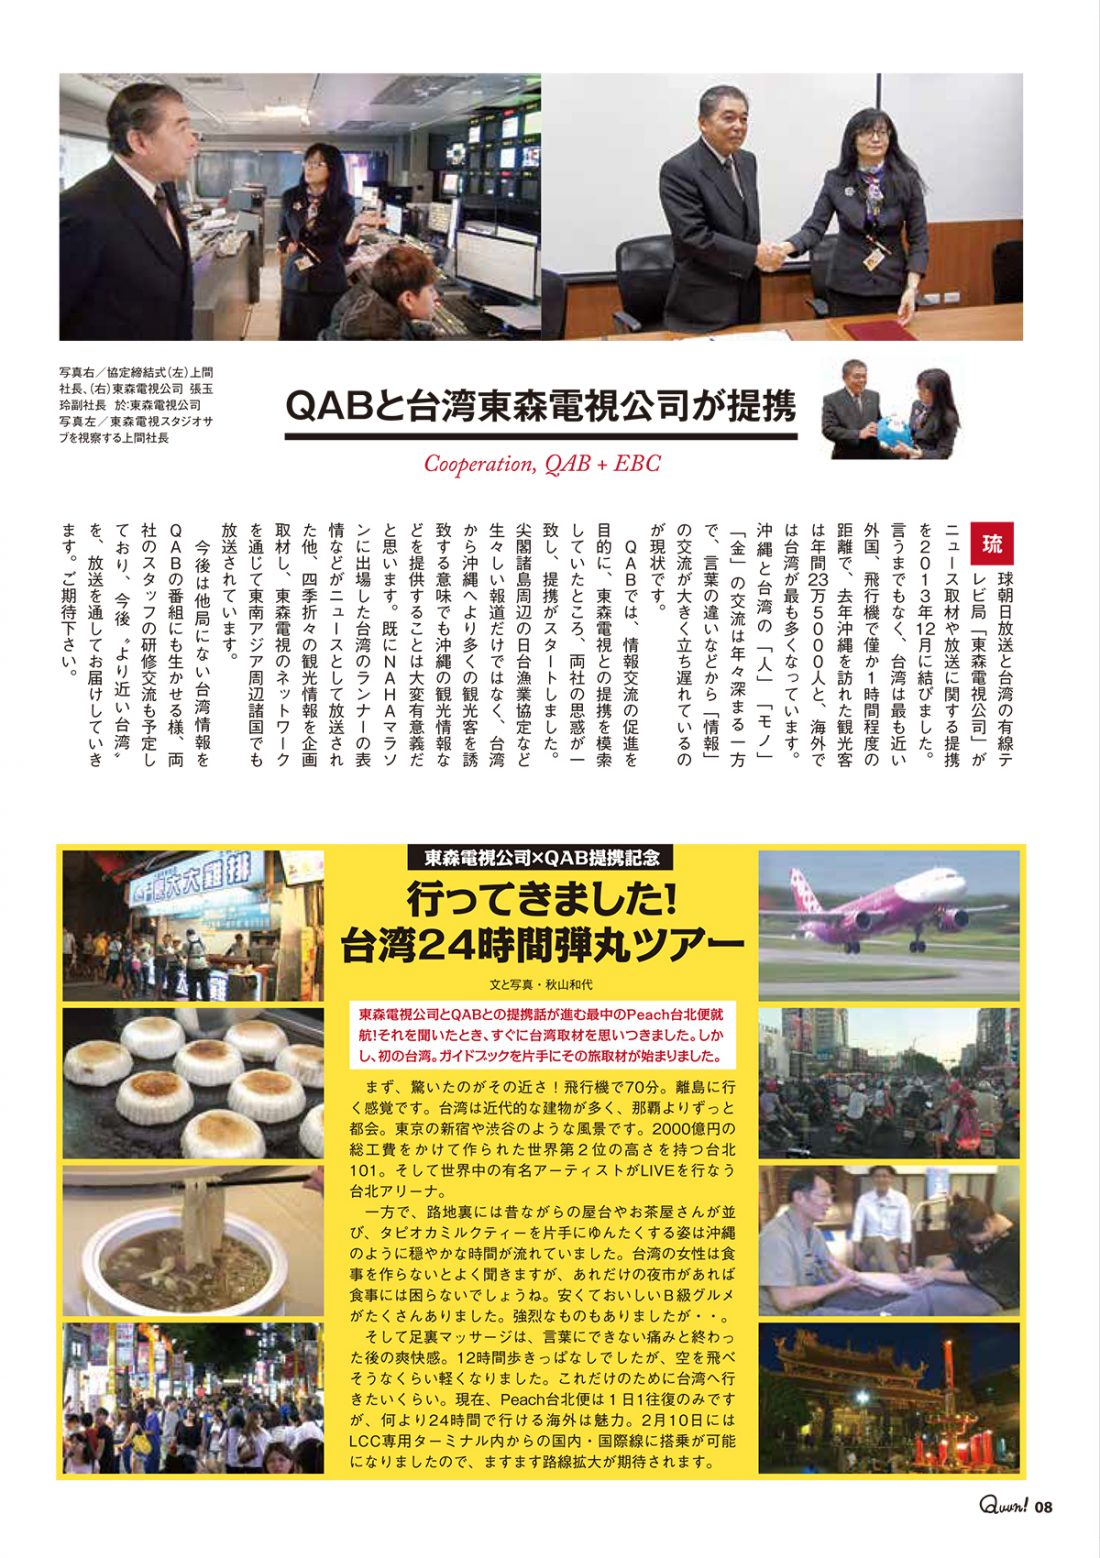 https://www.qab.co.jp/qgoro/wp-content/uploads/quun_0110-1100x1558.jpg